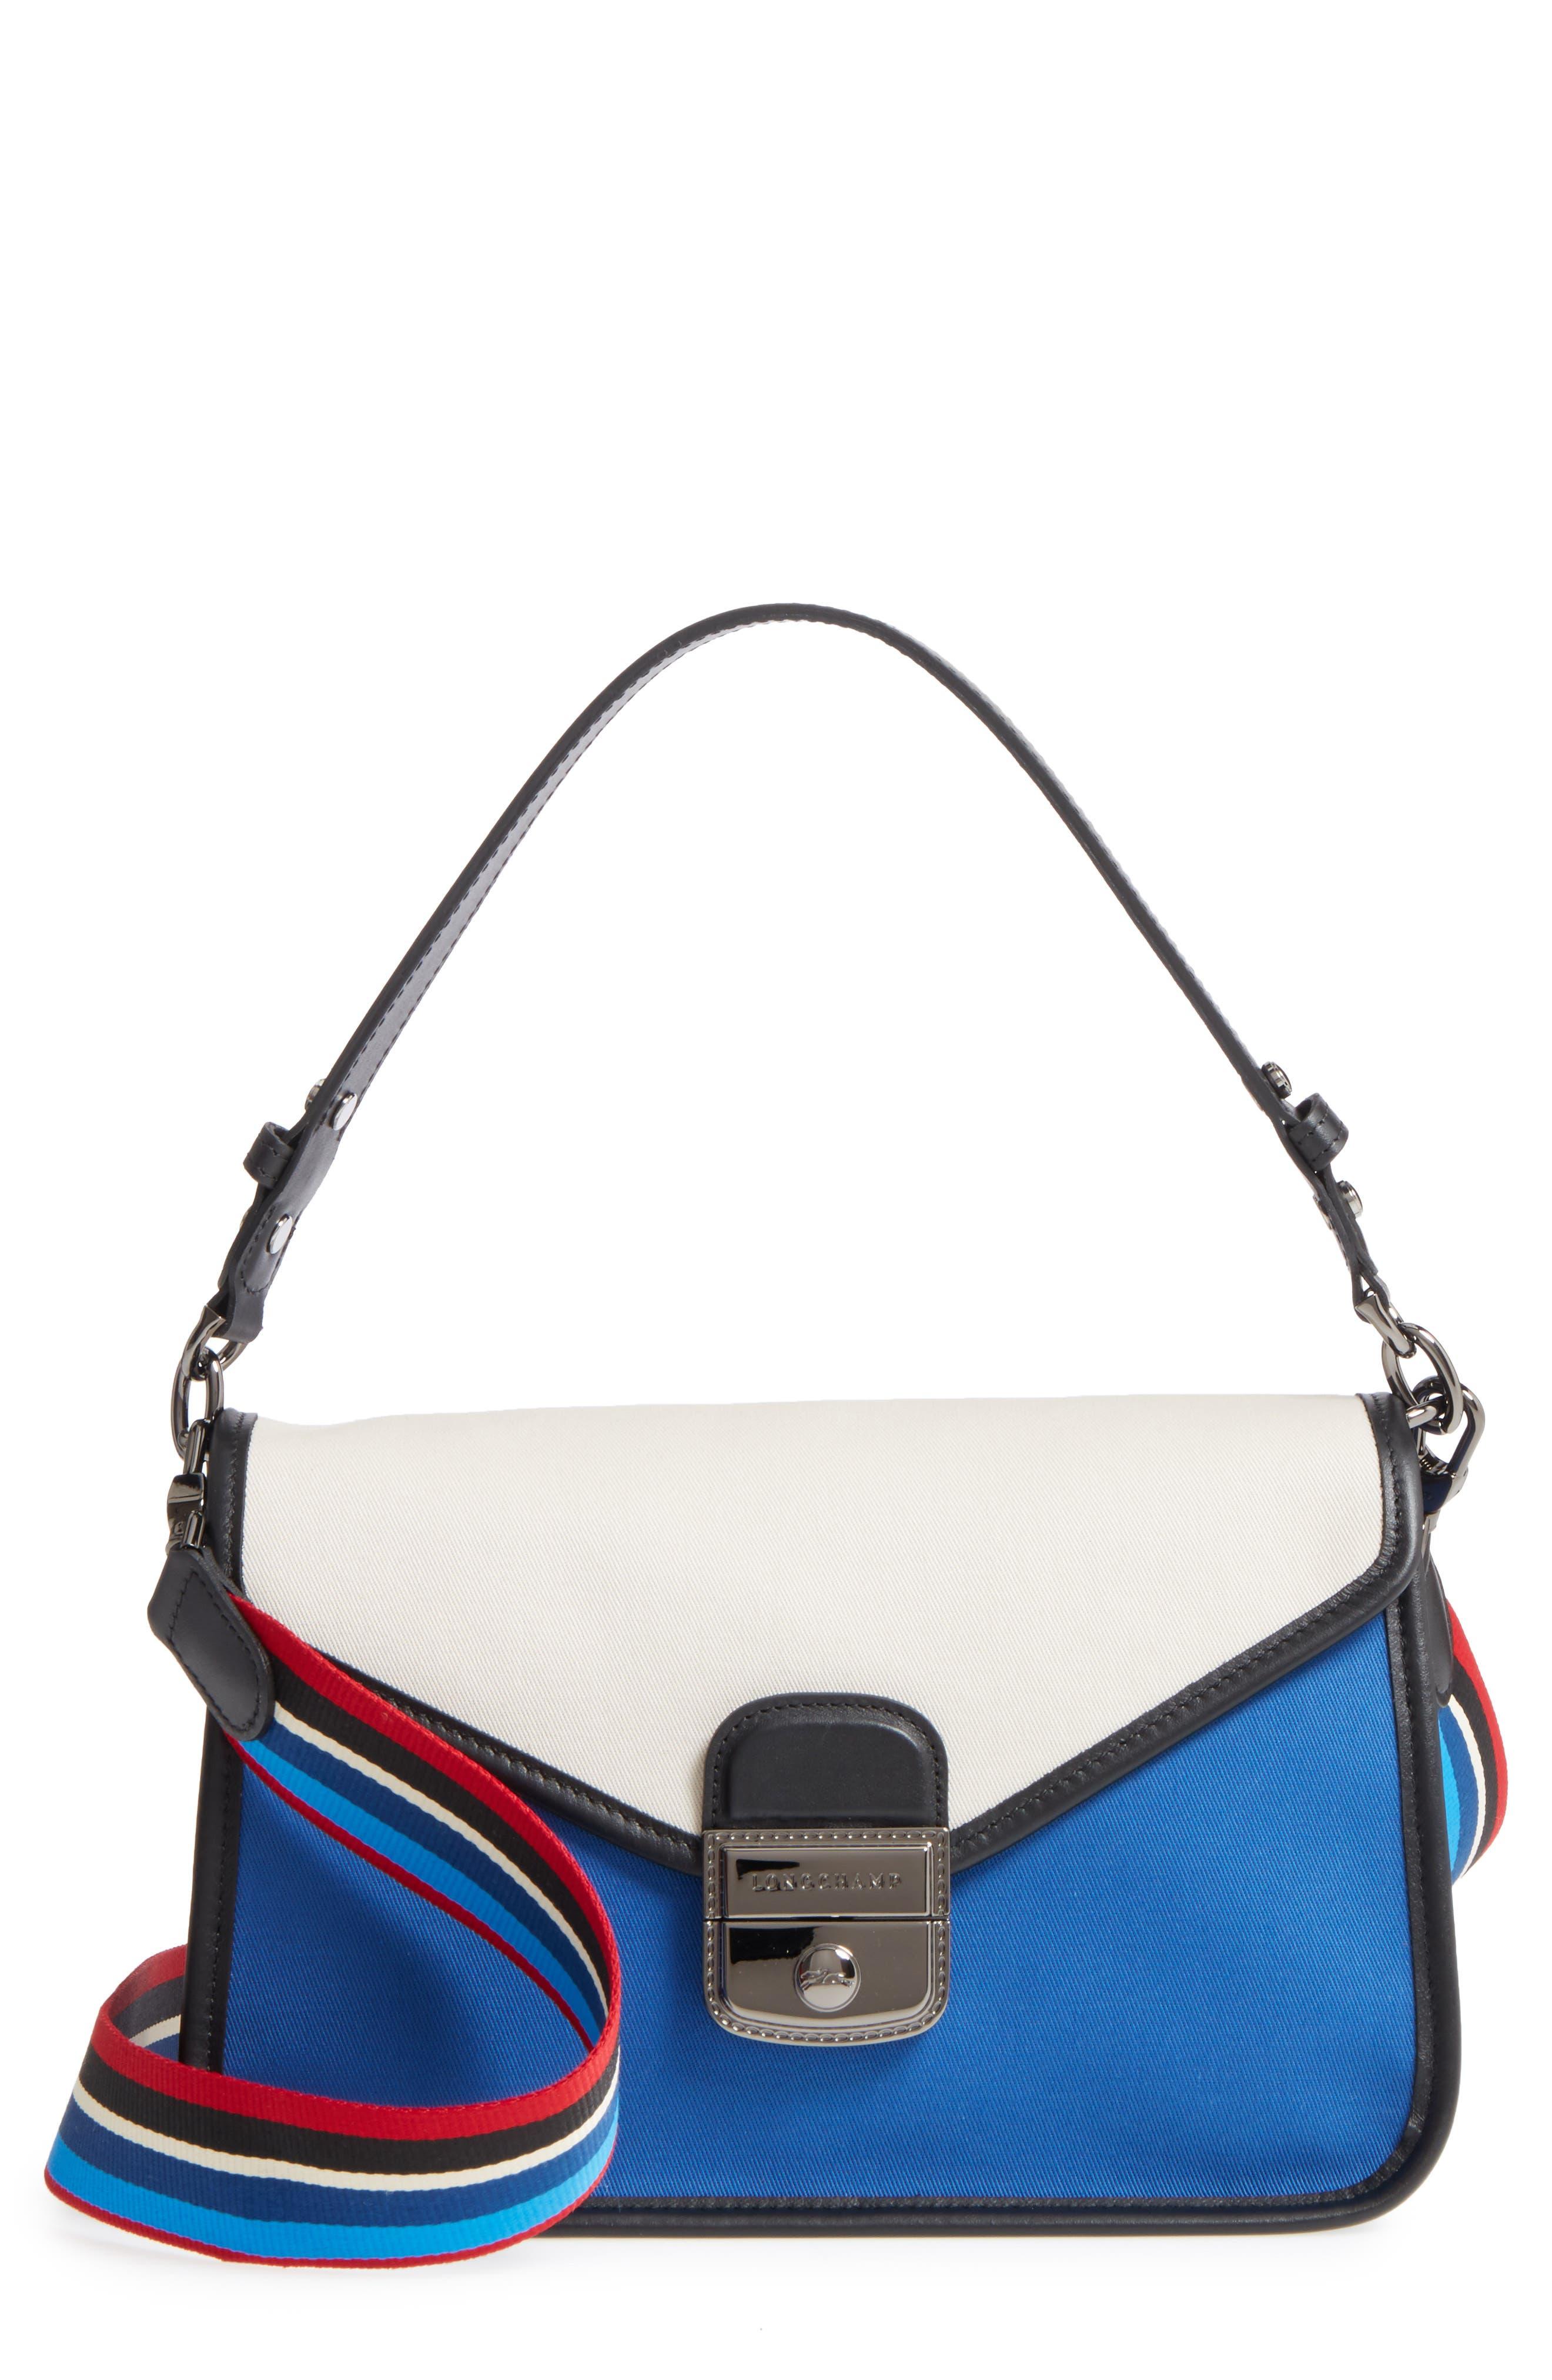 Alternate Image 1 Selected - Longchamp Mademoiselle Gabardine Canvas Shoulder Bag